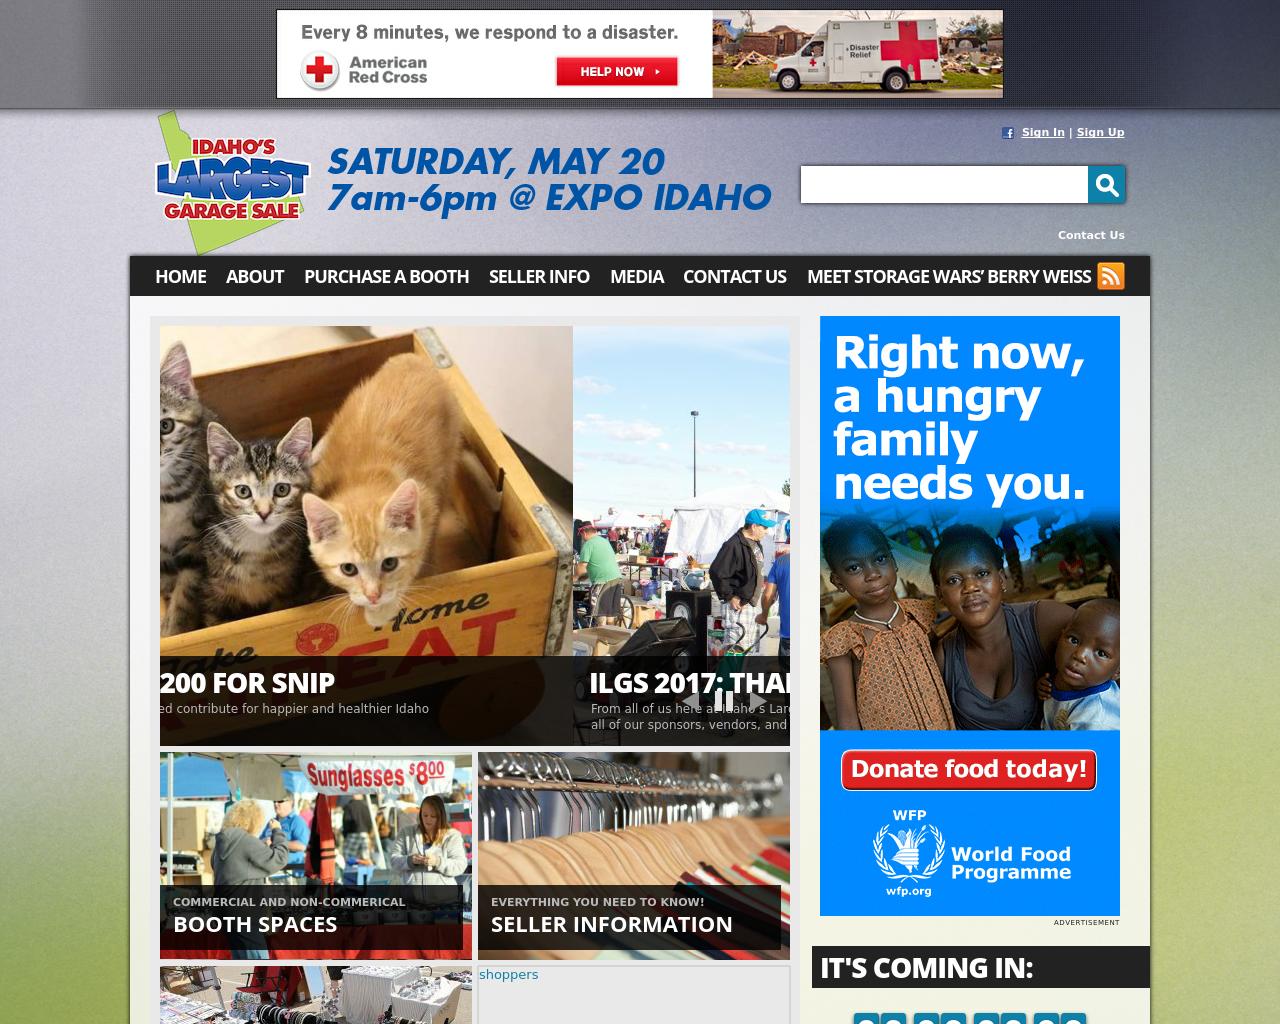 Idahoslargestgaragesale.com-Advertising-Reviews-Pricing